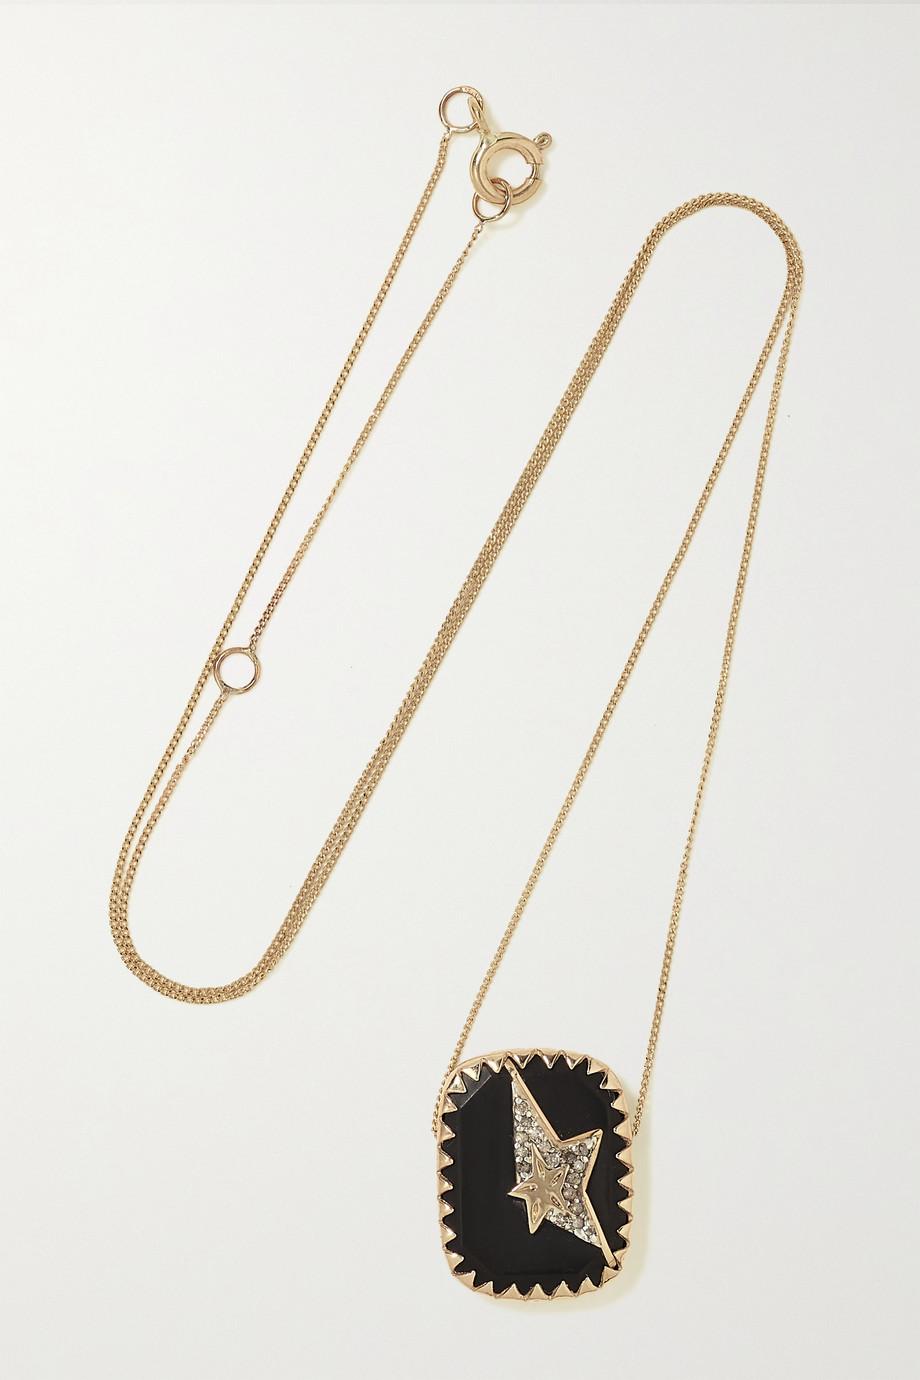 Pascale Monvoisin Varda N°1 9 and 14-karat gold, sterling silver and bakelite diamond necklace